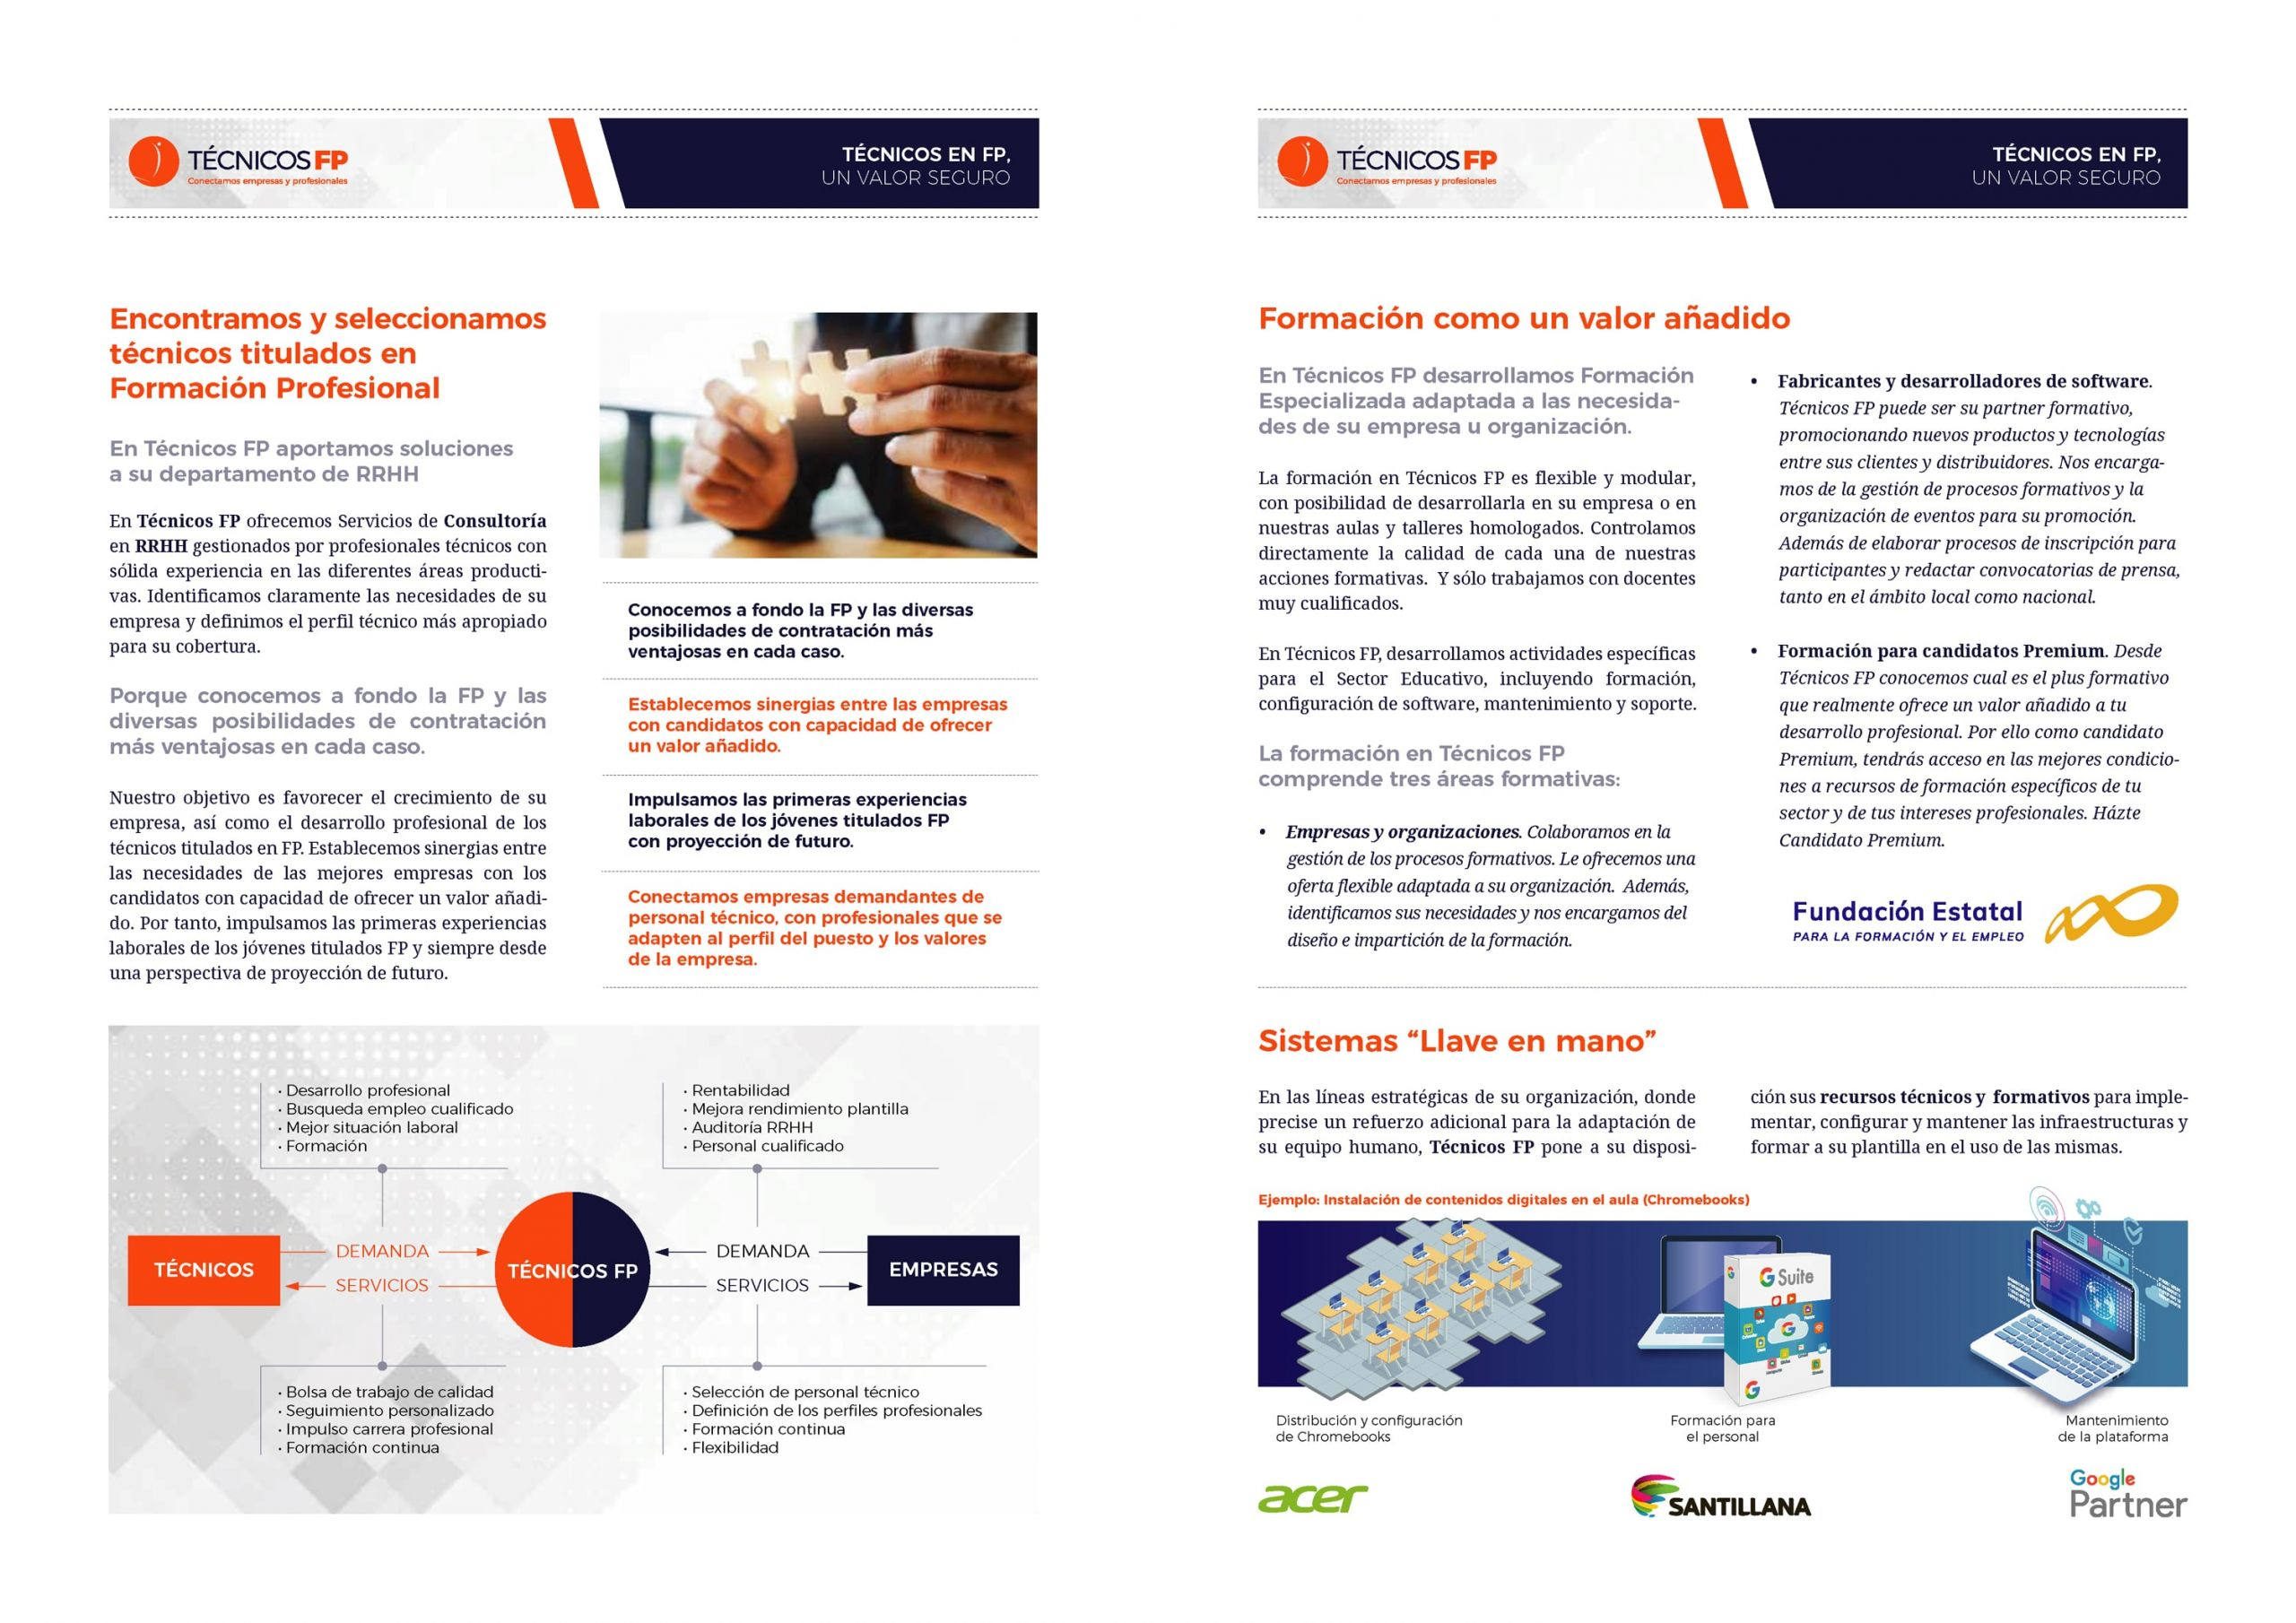 Técnicos FP Interior de folleto de presentación de empresa